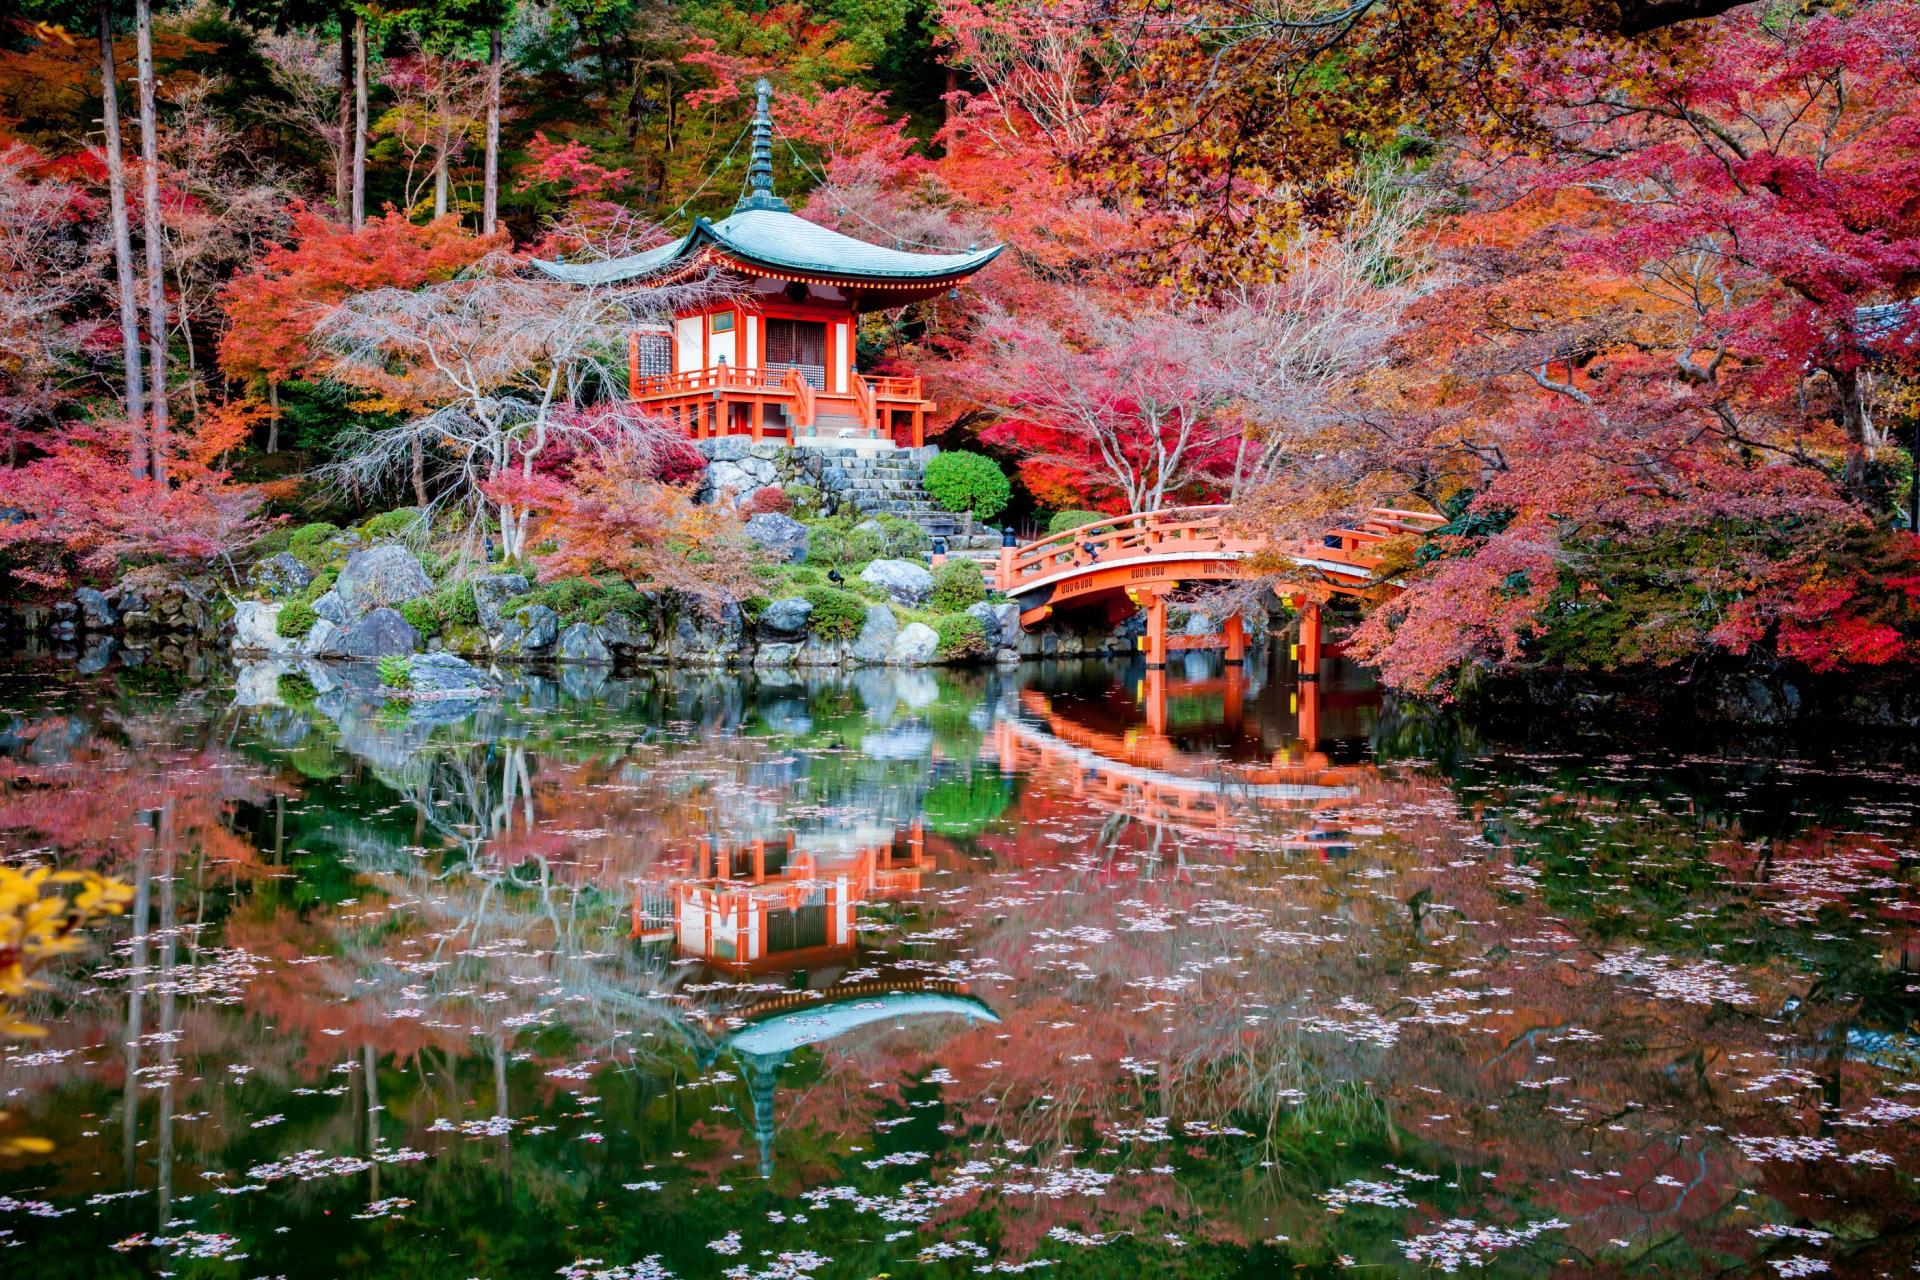 Японский сад москва 19 фотография